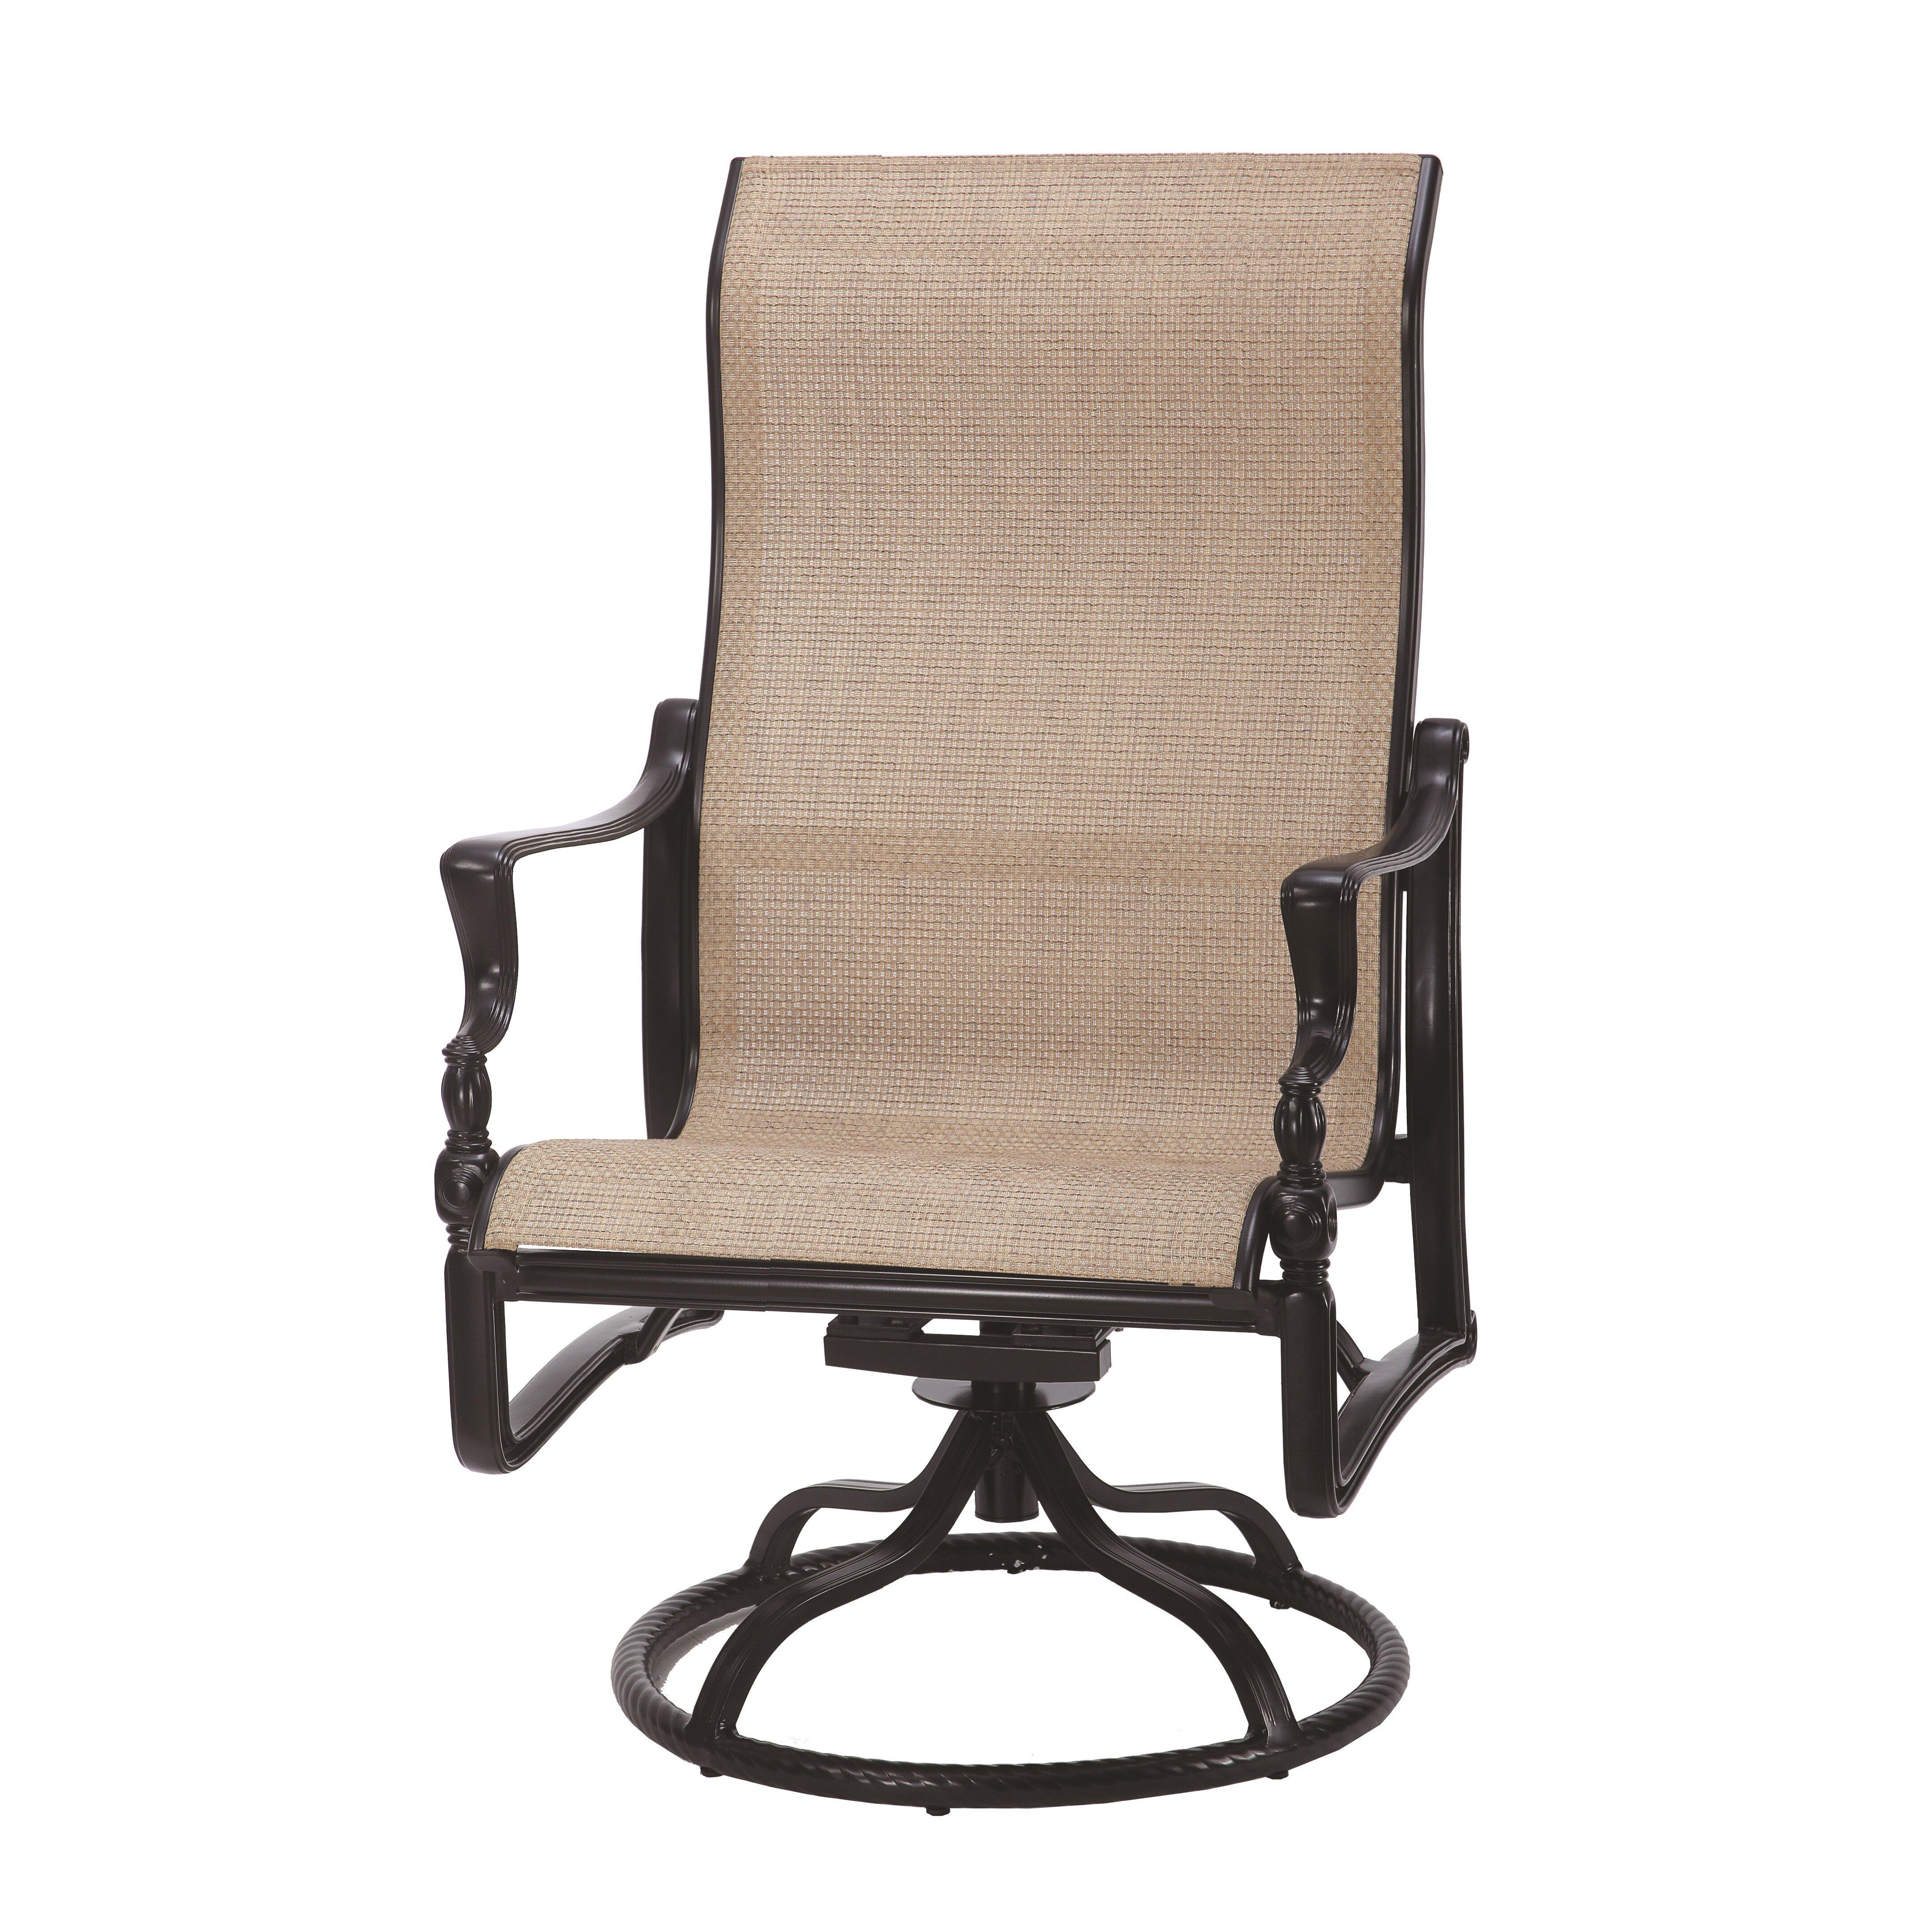 Gensun Casual Living Bel Air High Back Swivel Rocking Lounge Chair